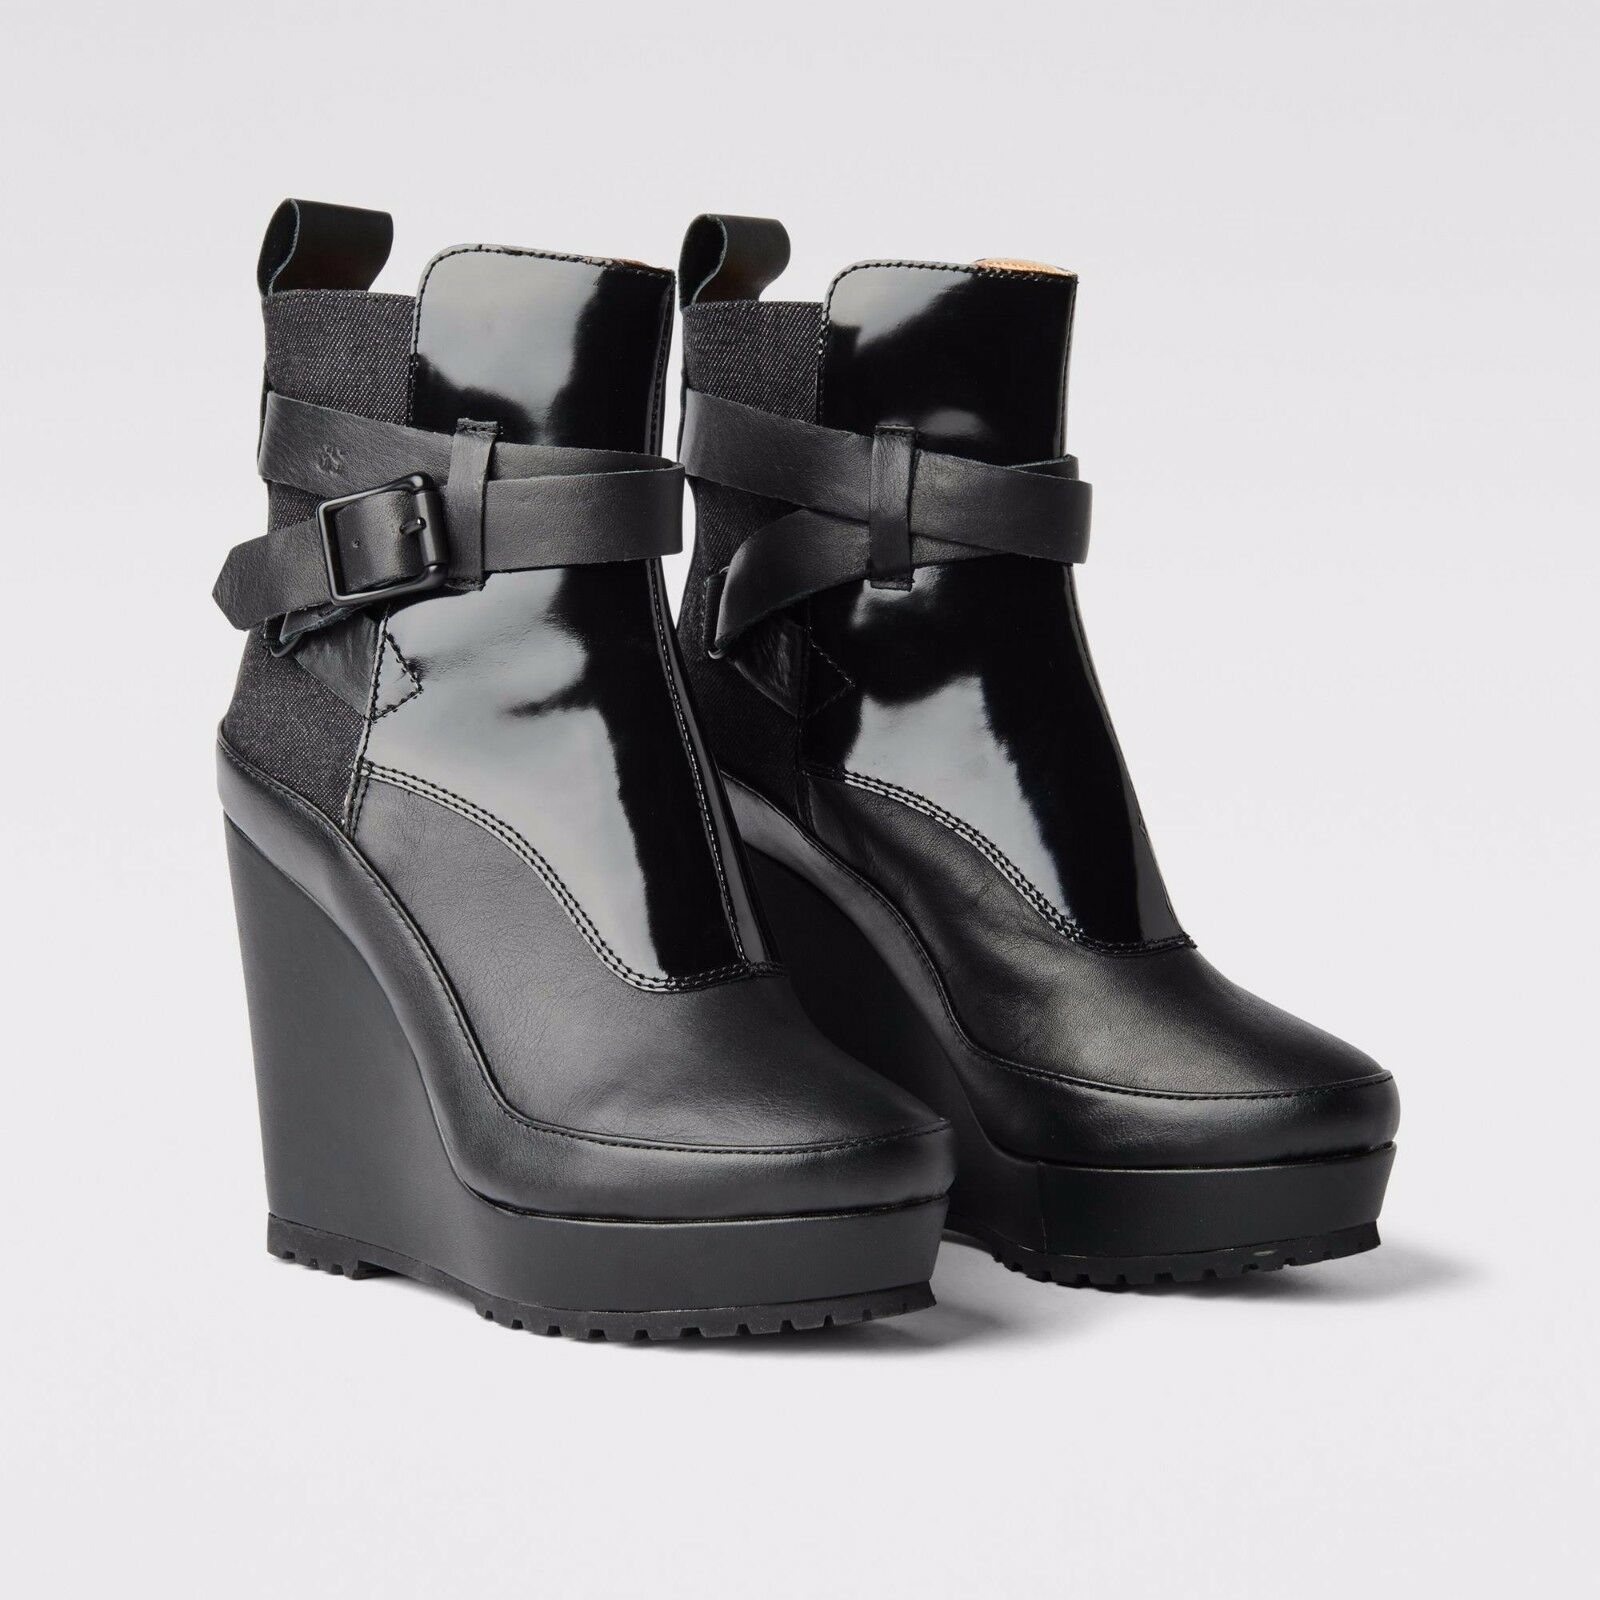 G Star Romero Cheval Strap Shine Boots New in Box Size US7 UK5 EU38